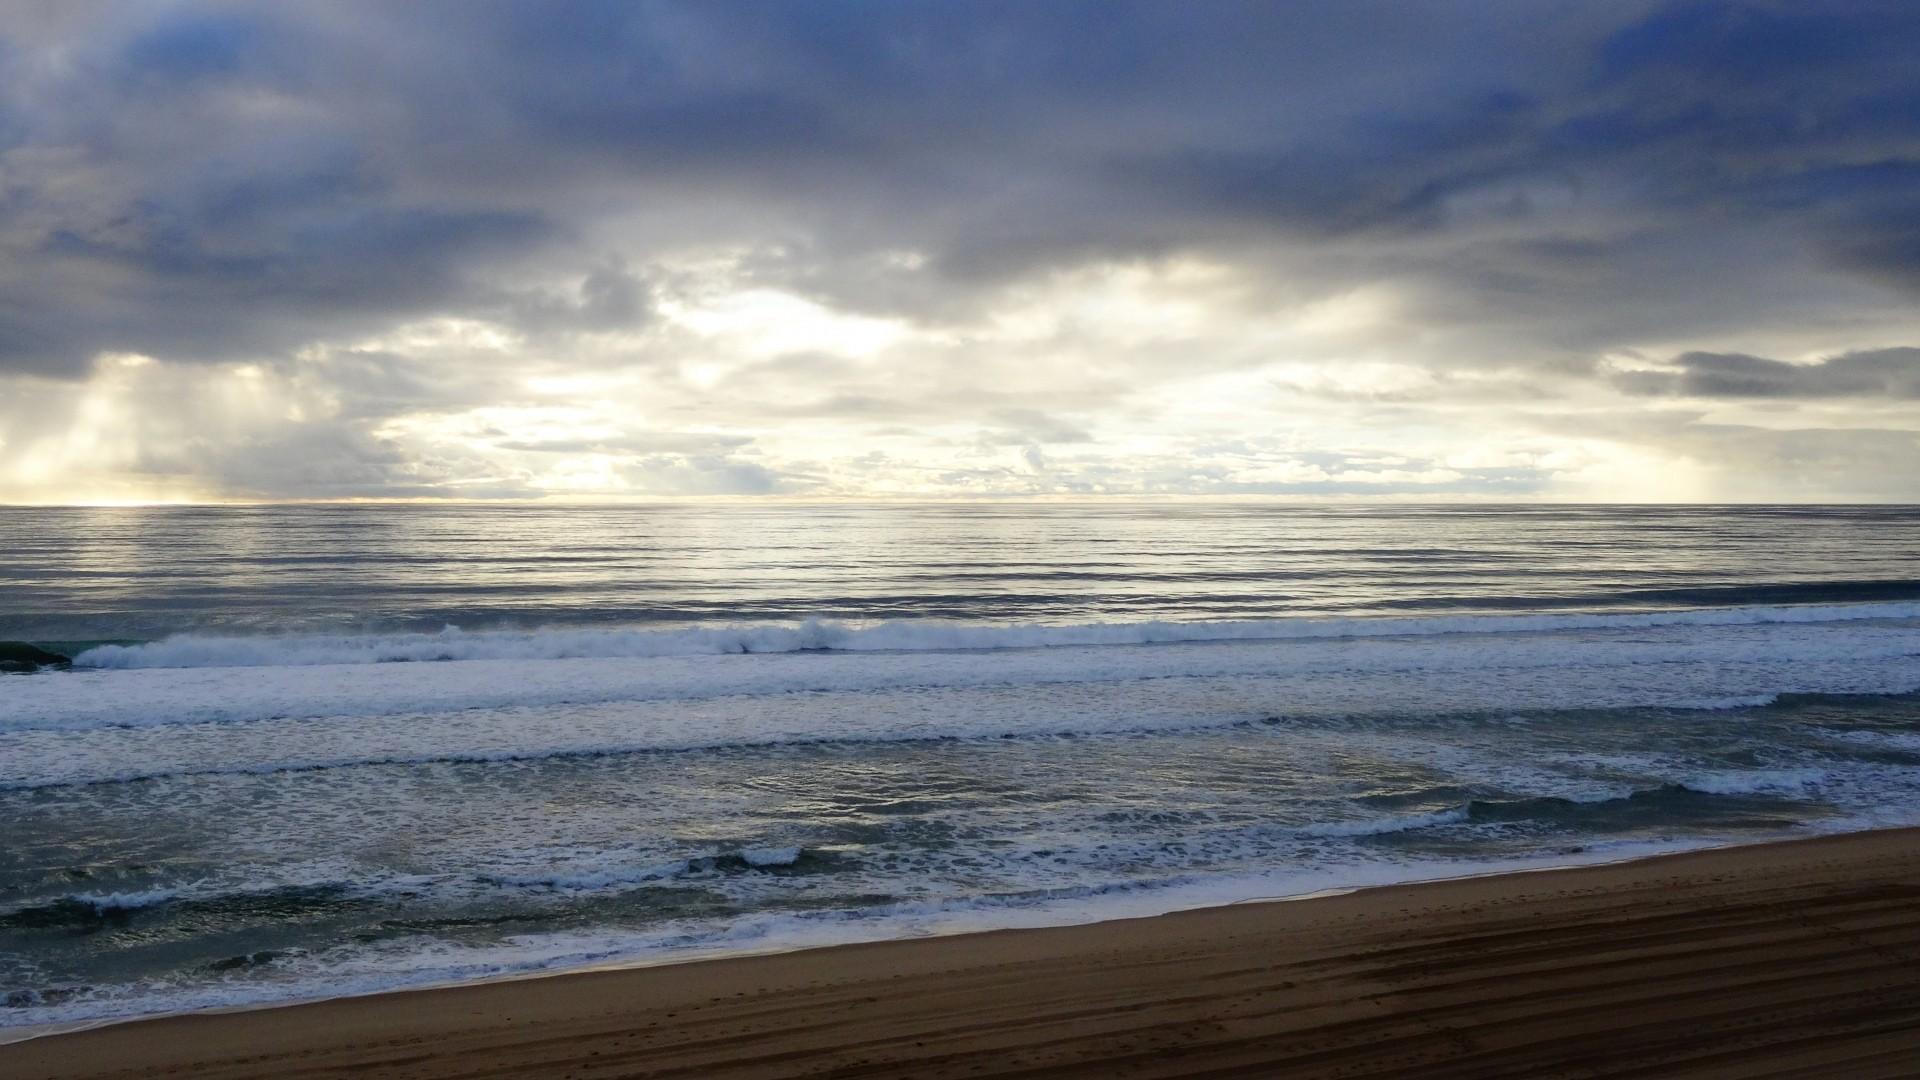 Res: 1920x1080, Full HD Wallpaper egypt mediterranean sea overcast